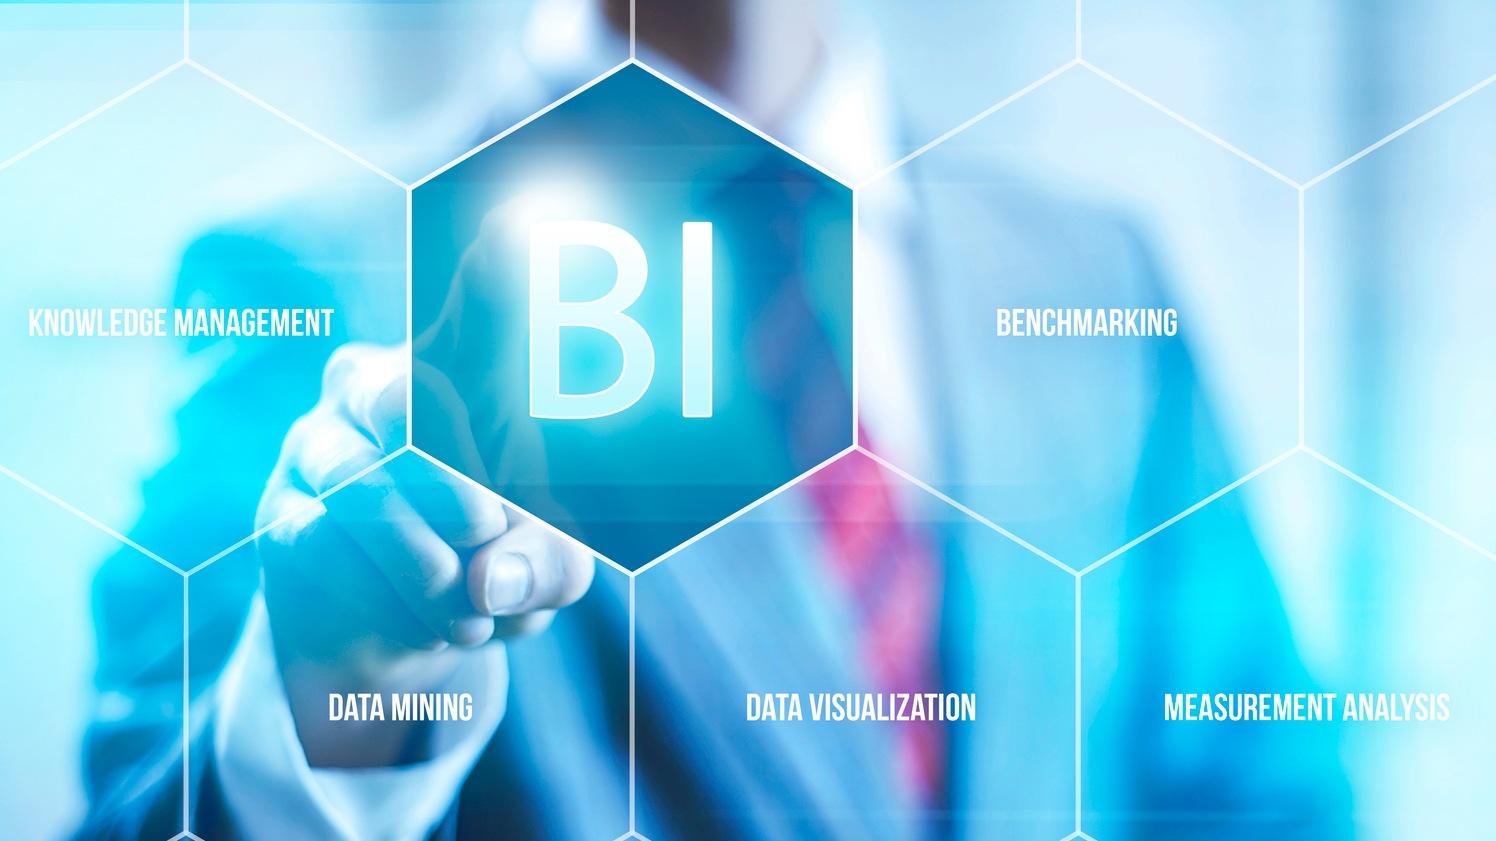 https://i0.wp.com/cdn.business2community.com/wp-content/uploads/2014/08/Business-Intelligence.jpg